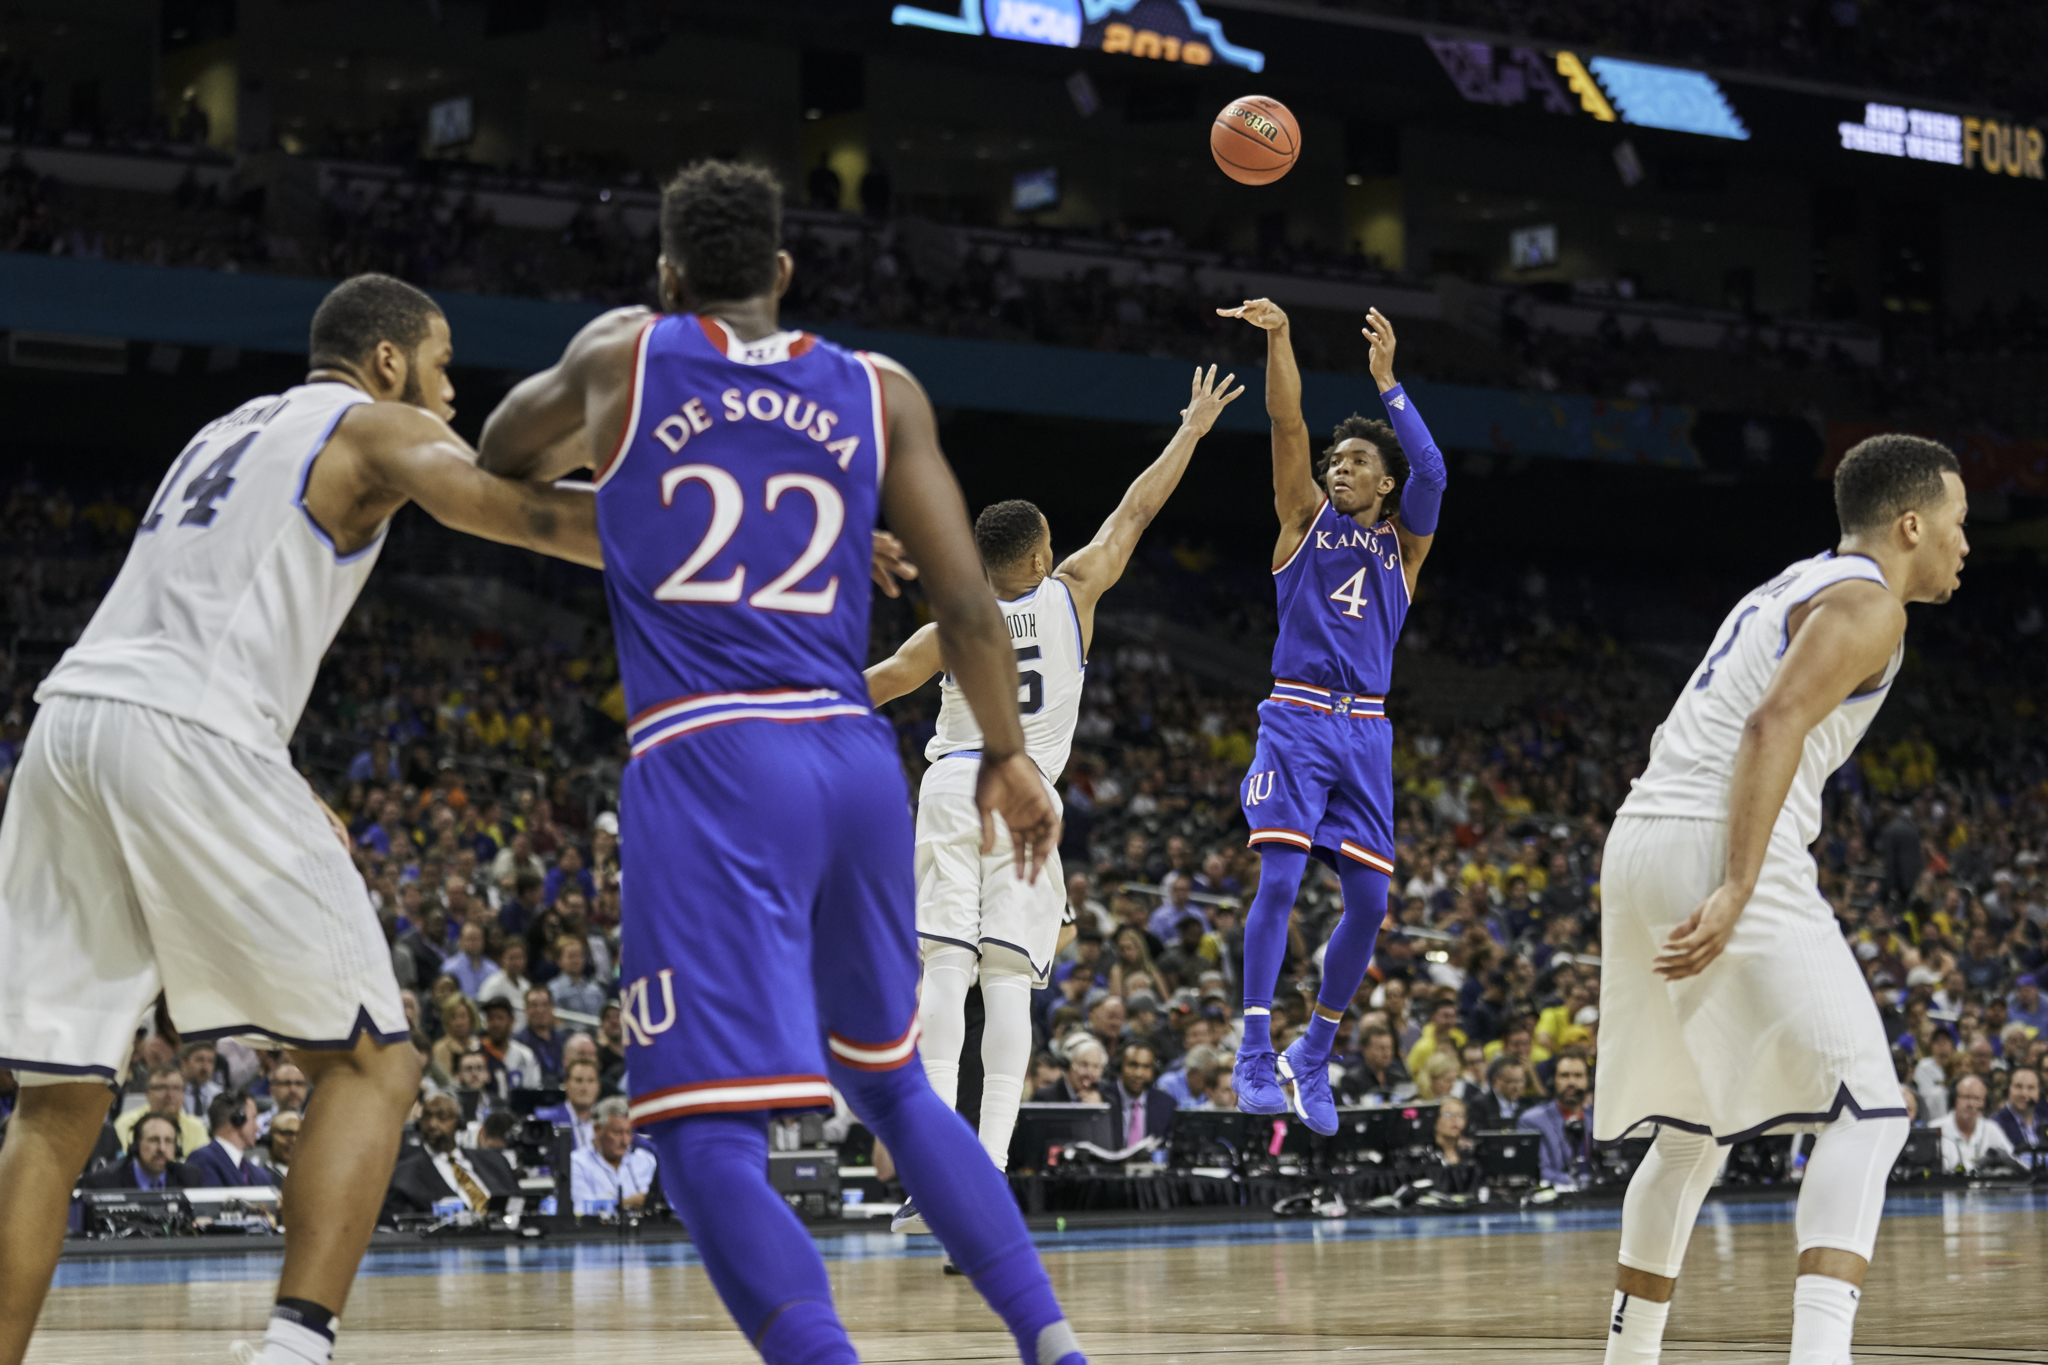 Devonte' Graham puts up a three point shot for Kansas.   Sony A9, Sony 70-200mm f2.8 GM